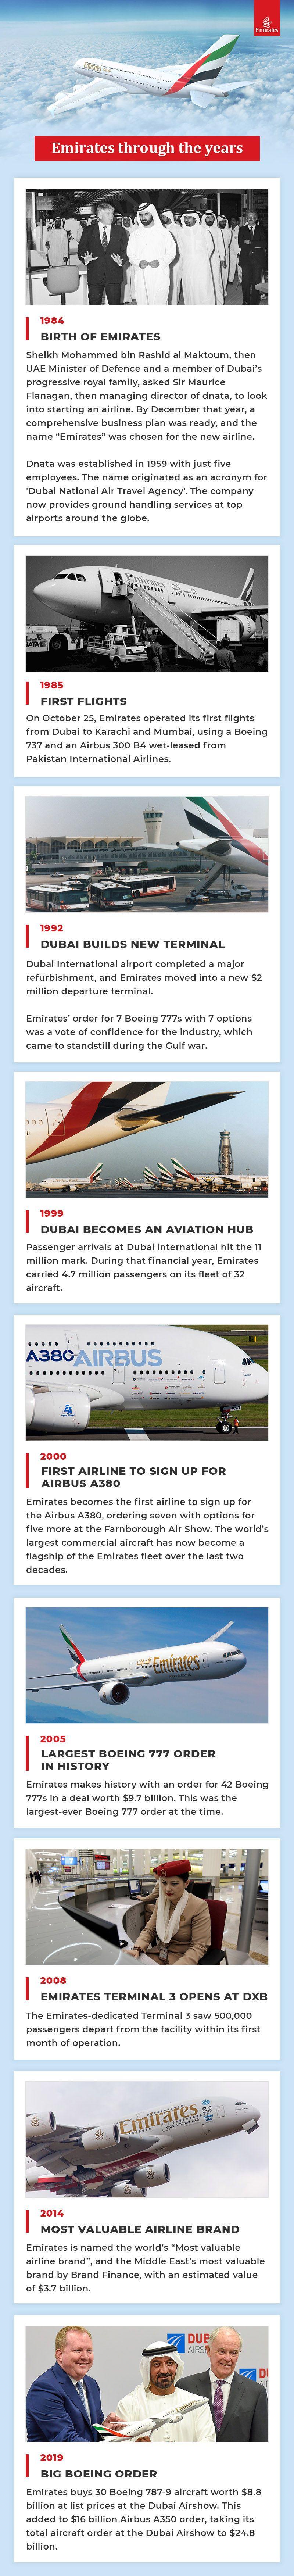 Emirates success story